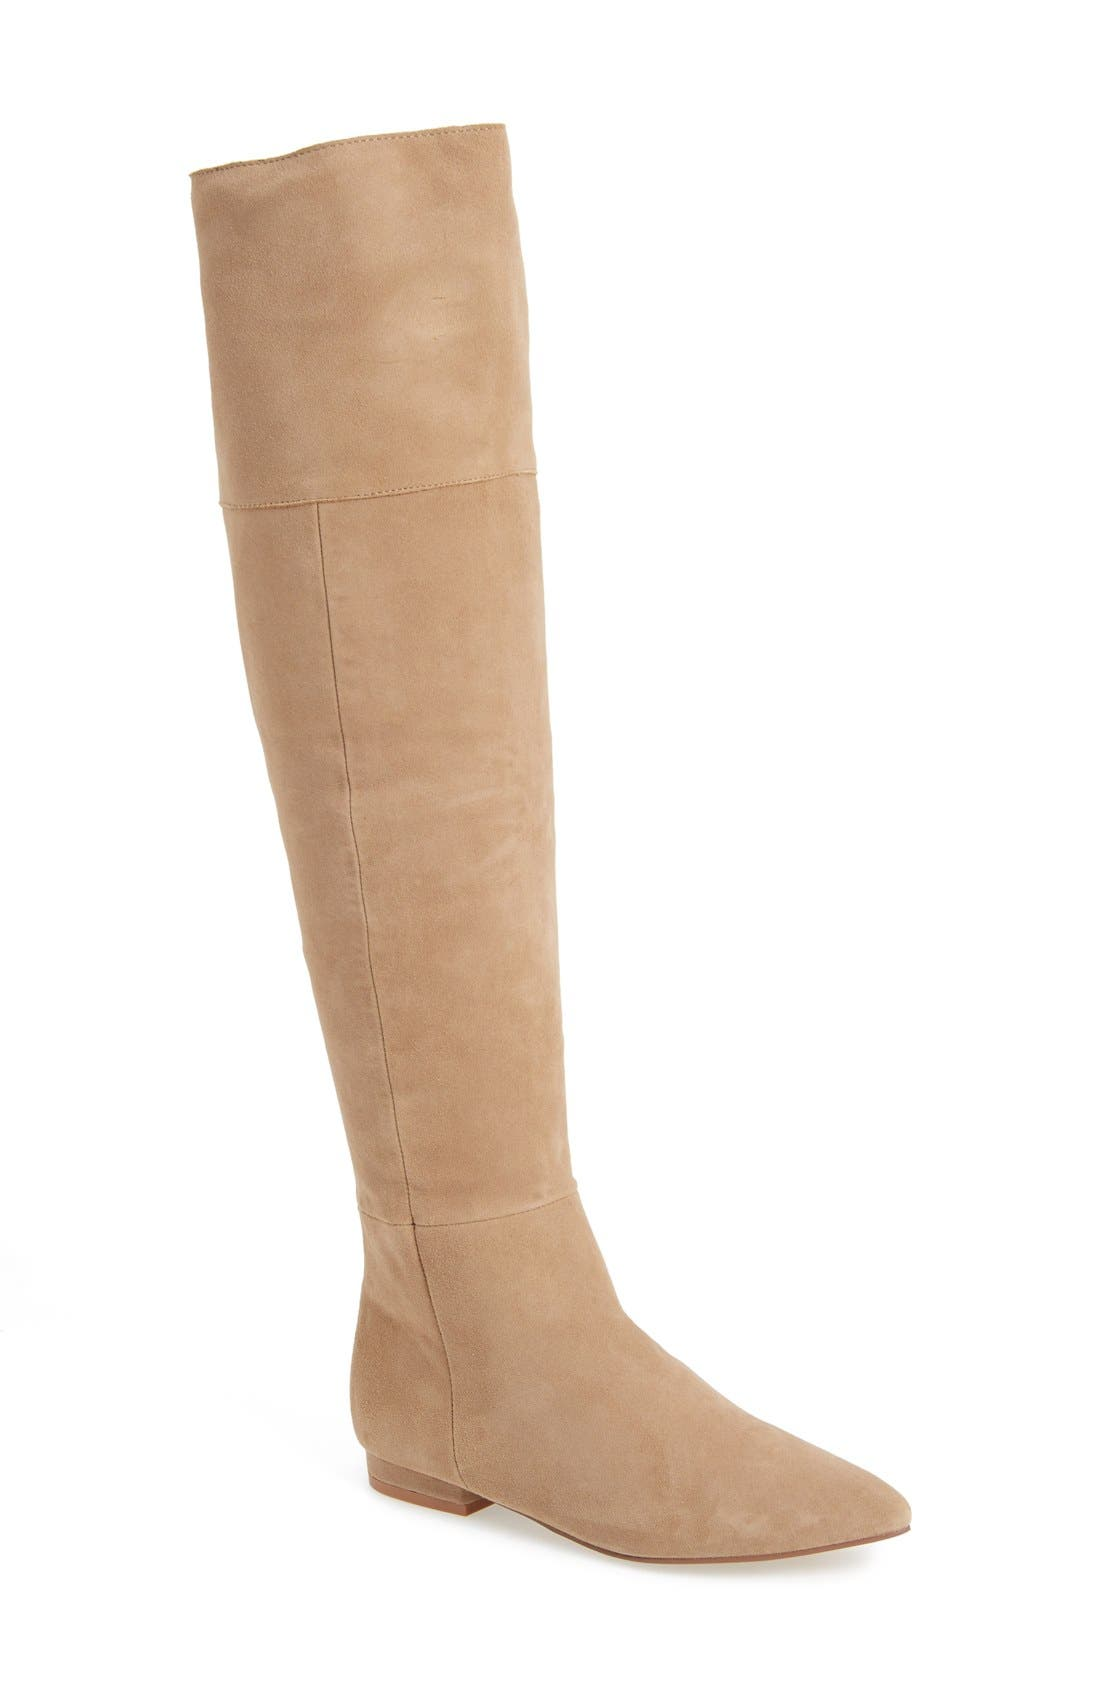 Kristin Cavallari'York' Over the Knee Boot (Women)